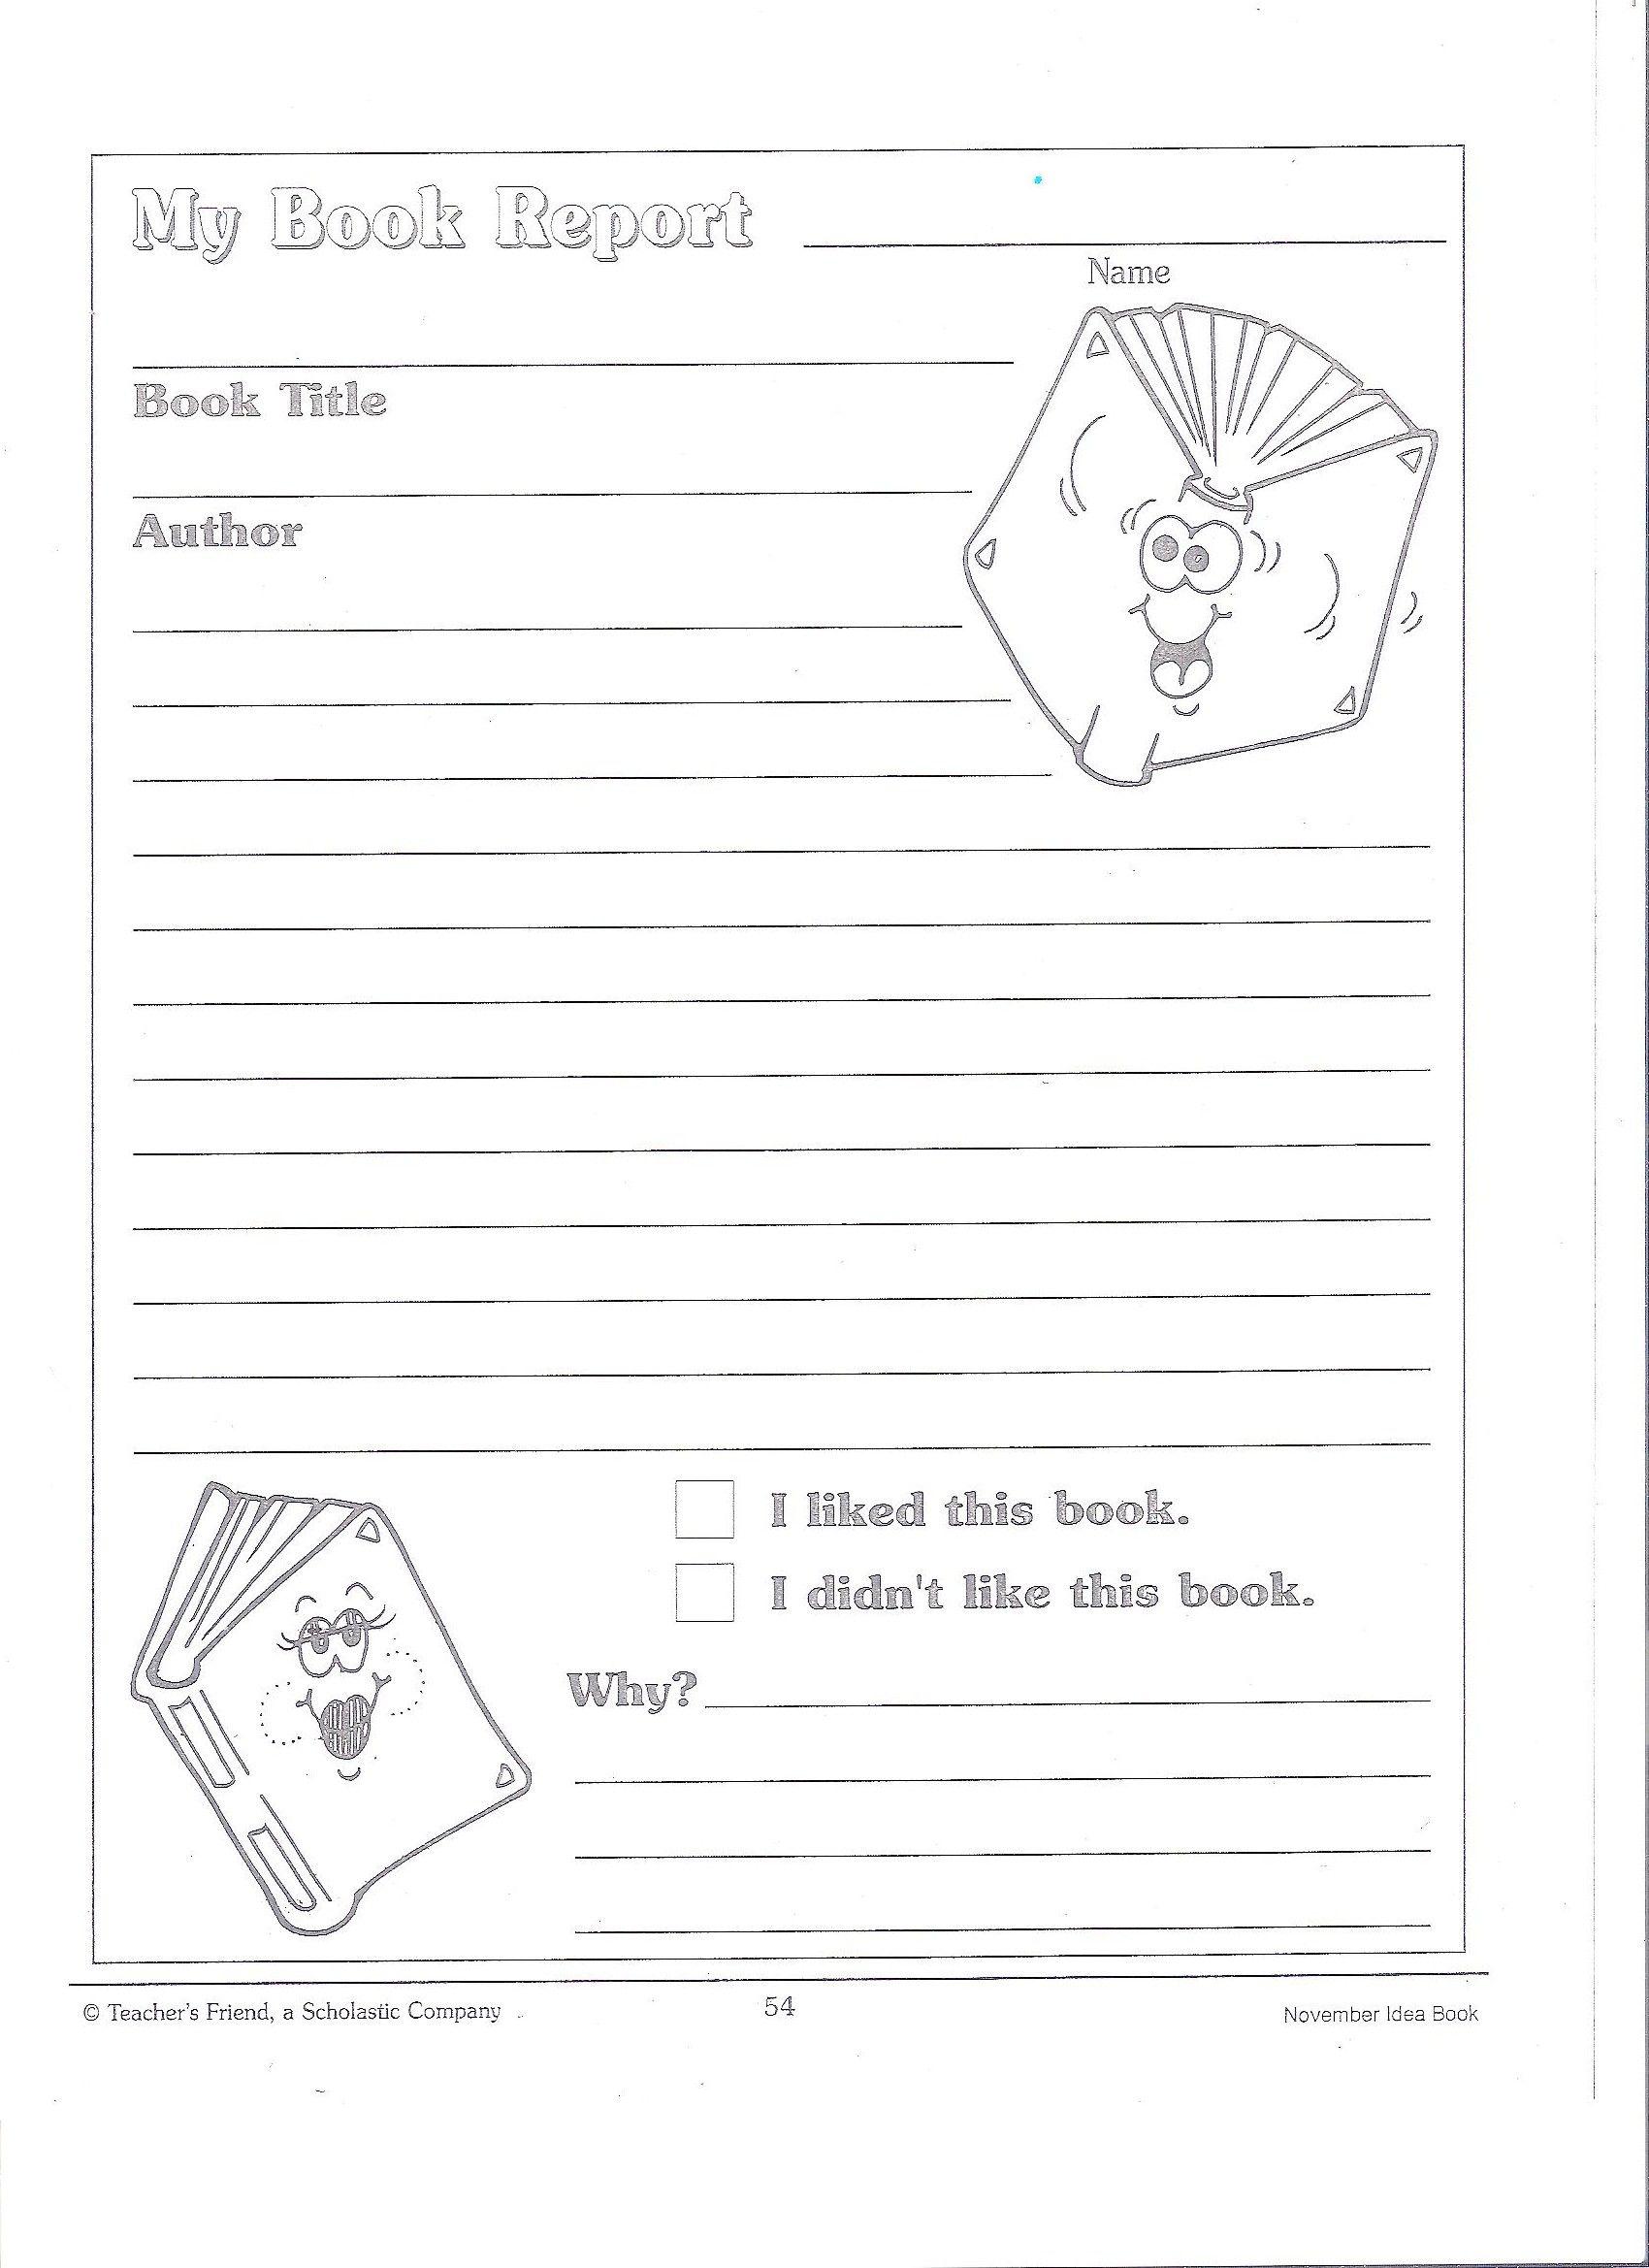 Book report guidelines 4th grade